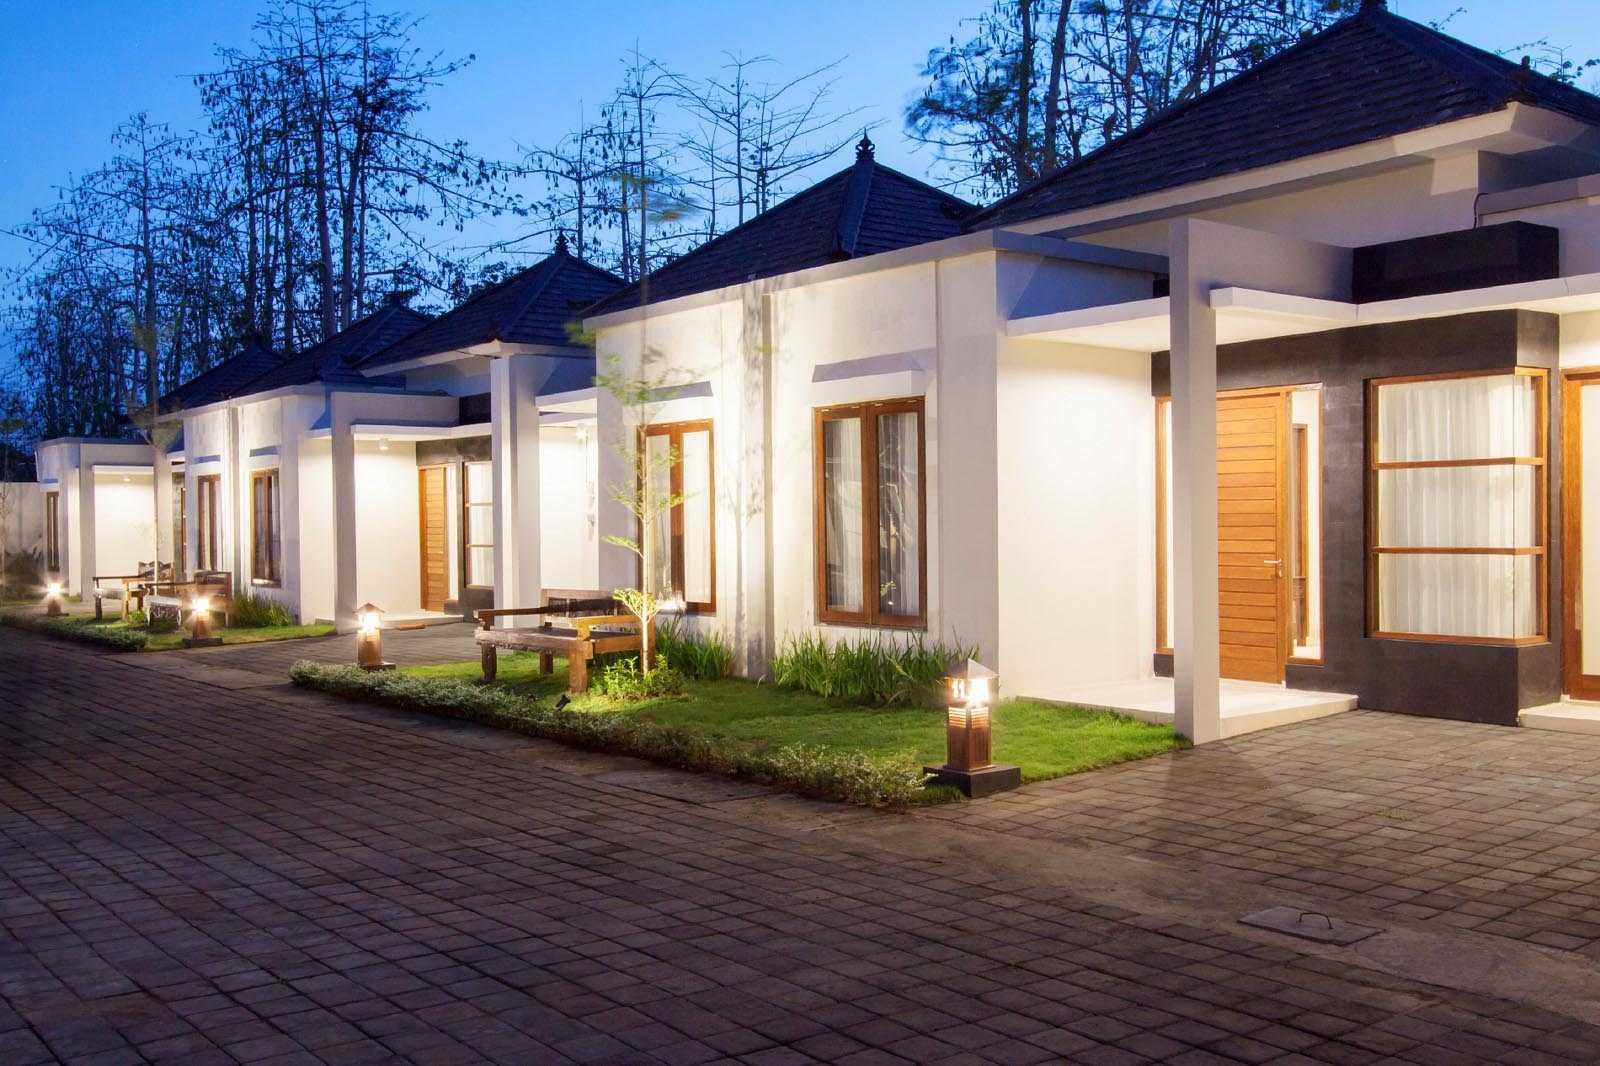 Budi Zhou Villa Casa De Ungasan Bali, Indonesia Bali, Indonesia Img2763   32692